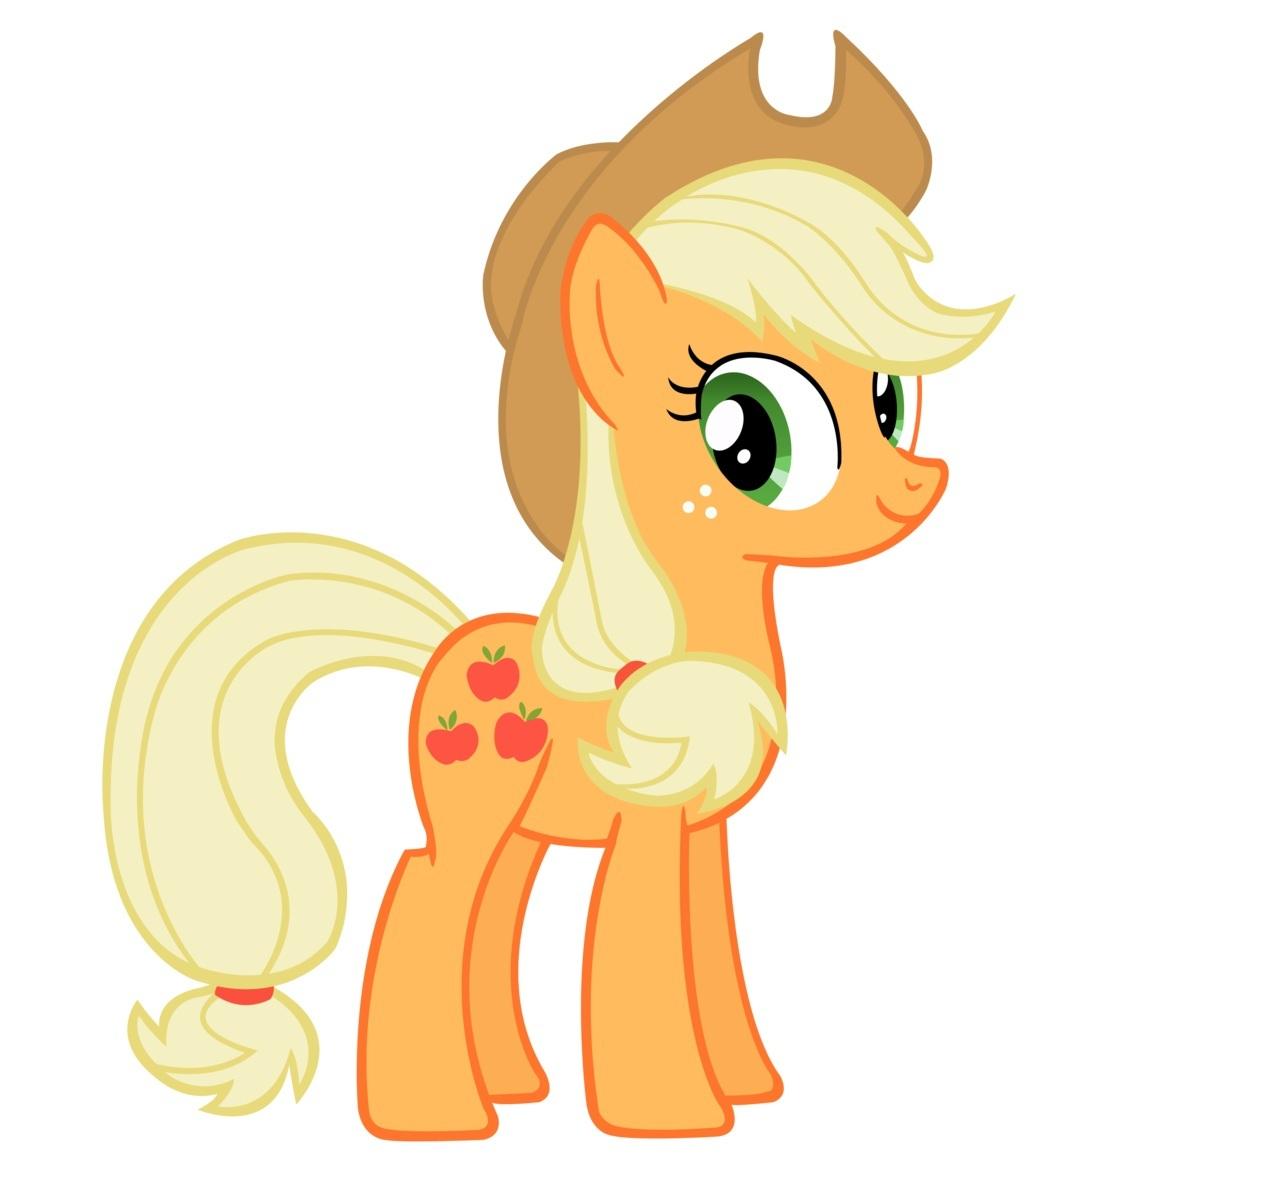 Animated My Little Pony Wallpaper - WallpaperSafari